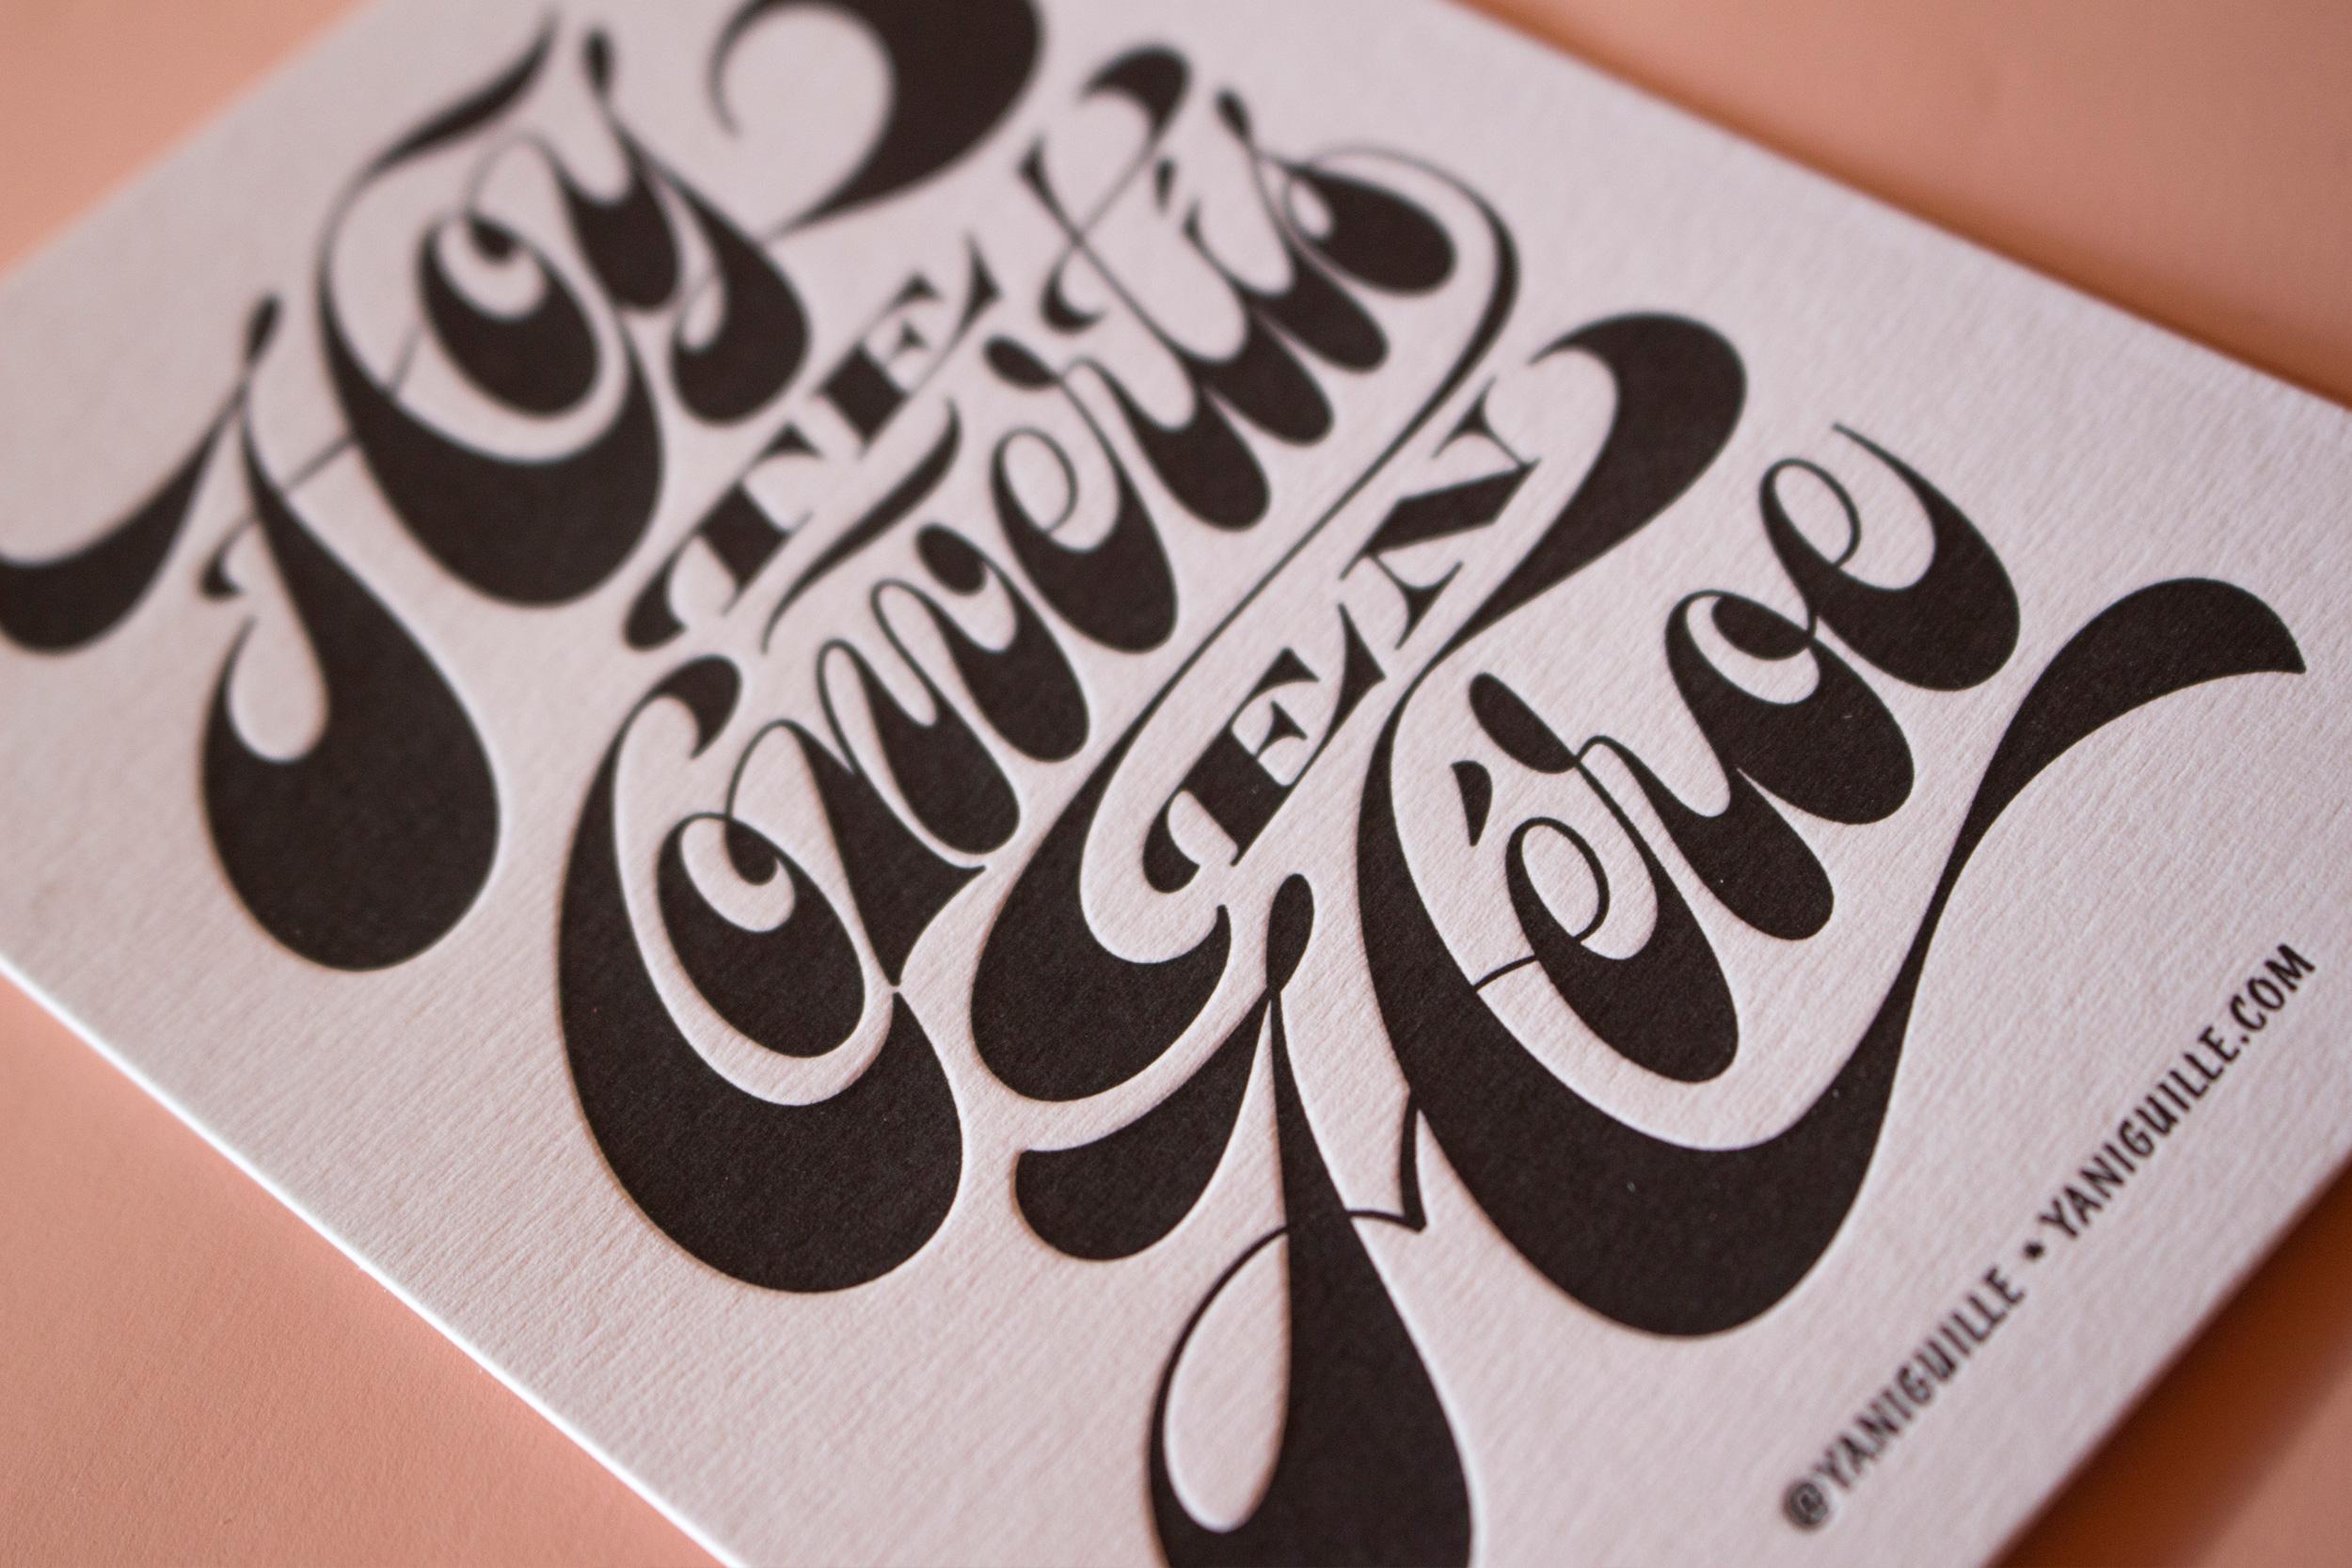 postales-guilleyyani4-papel-principal-letterpress-imprenta-tipografica-1.jpg